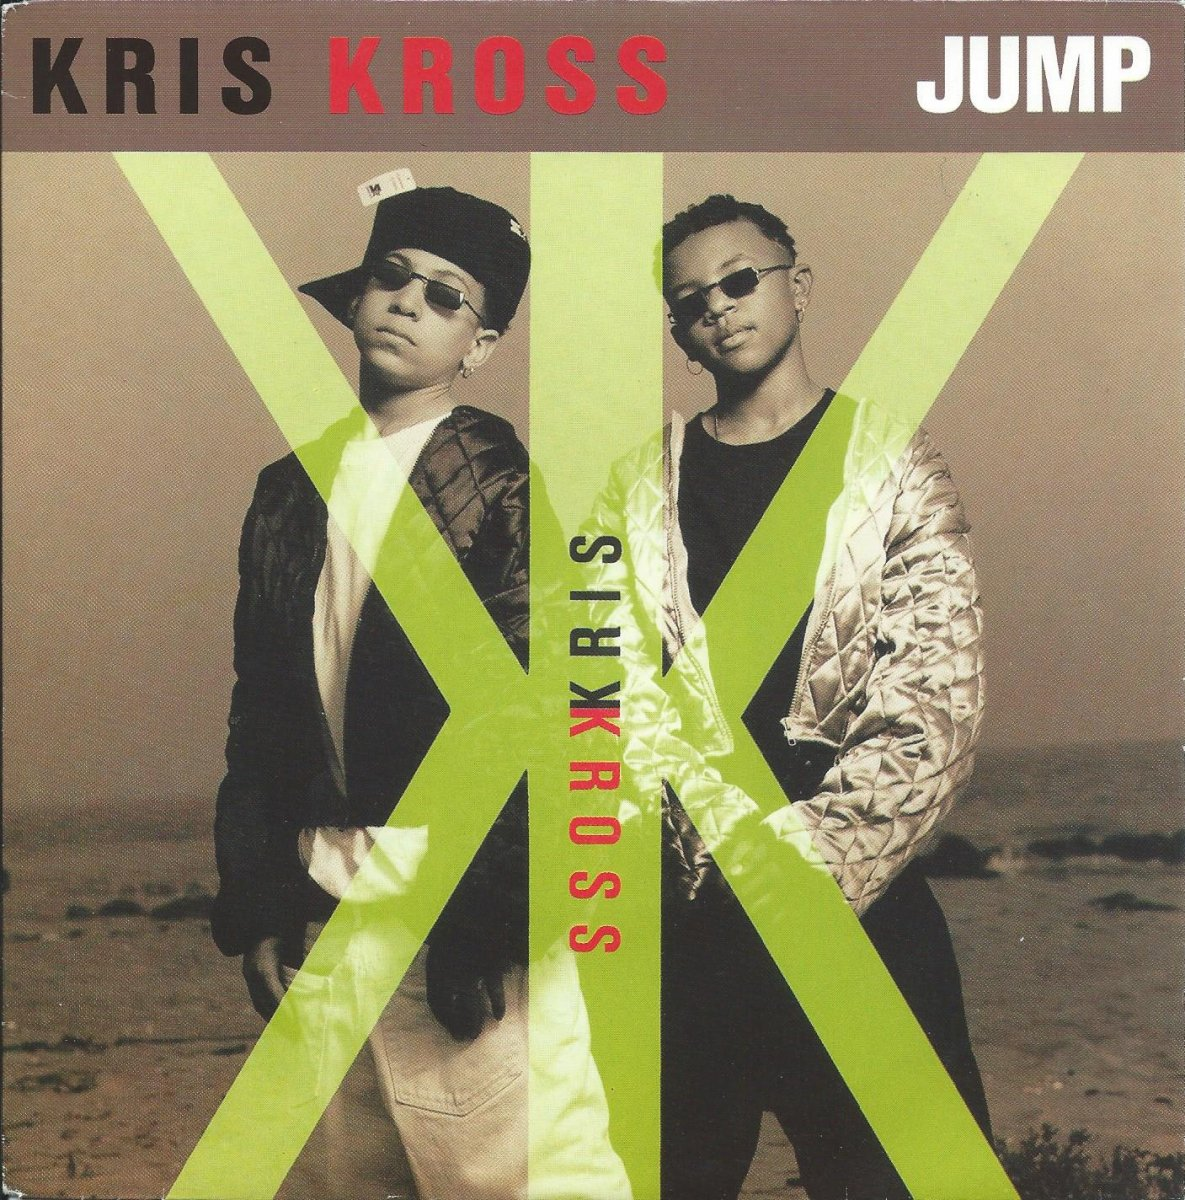 KRIS KROSS / JUMP / LIL BOYS IN DA HOOD (7